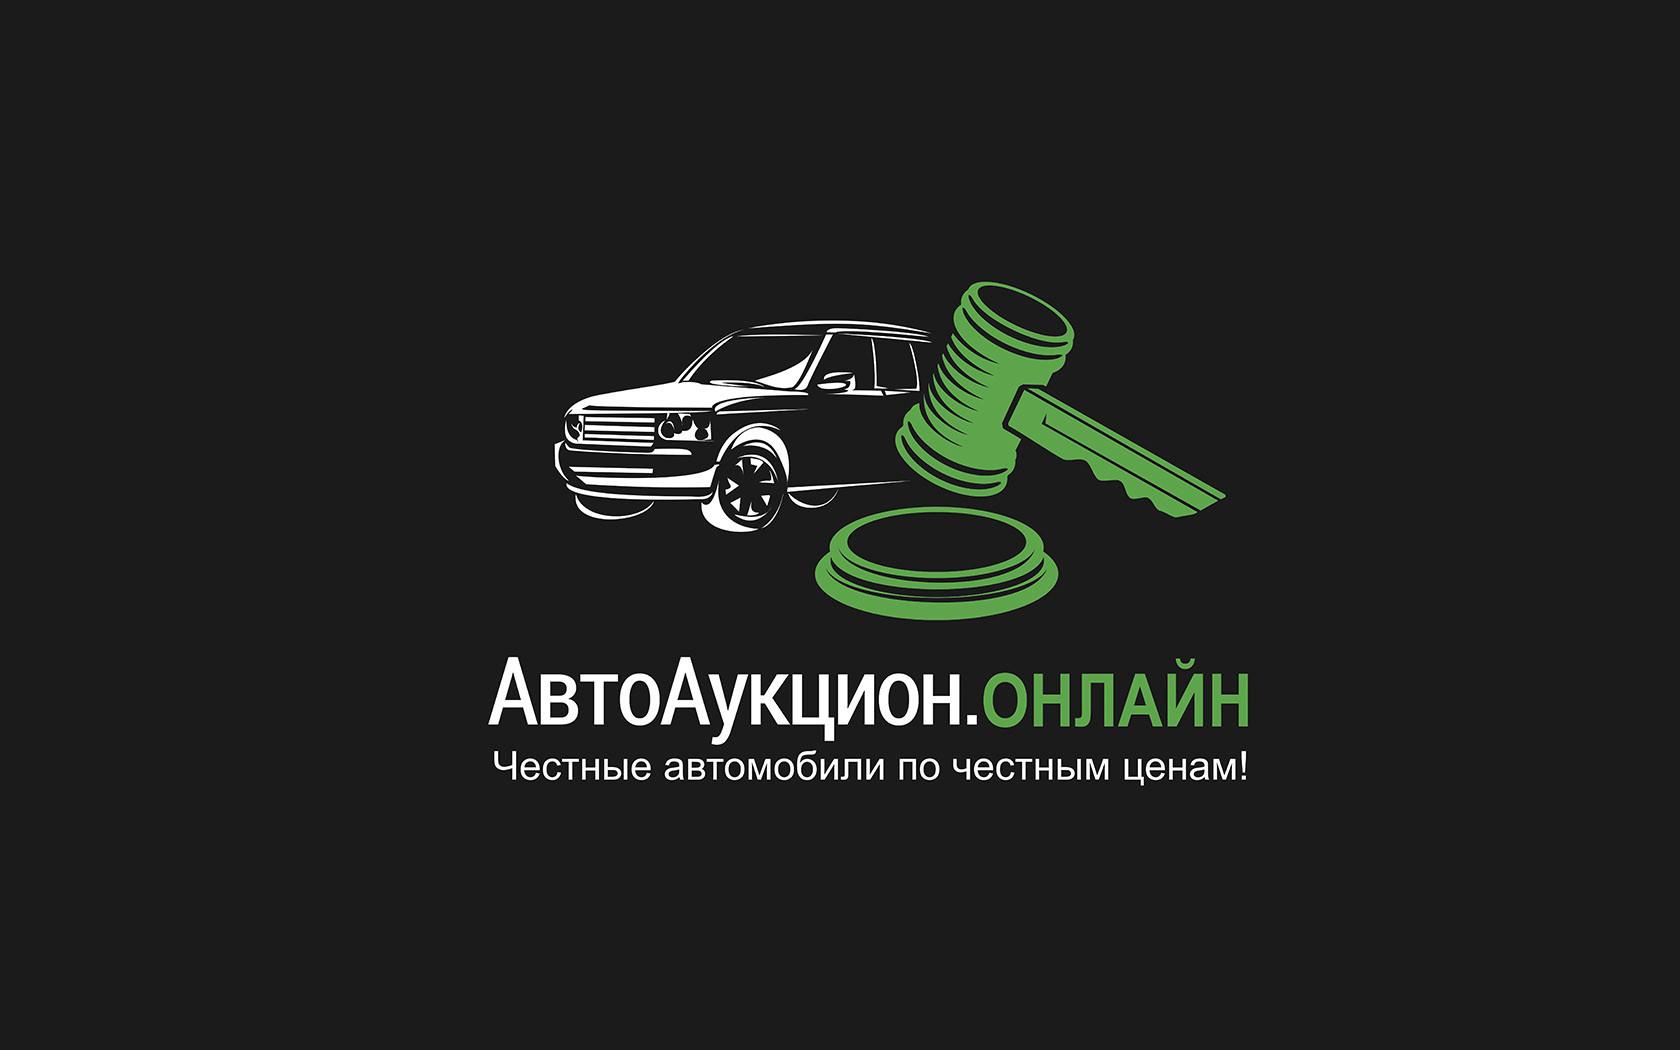 Автоаукцион